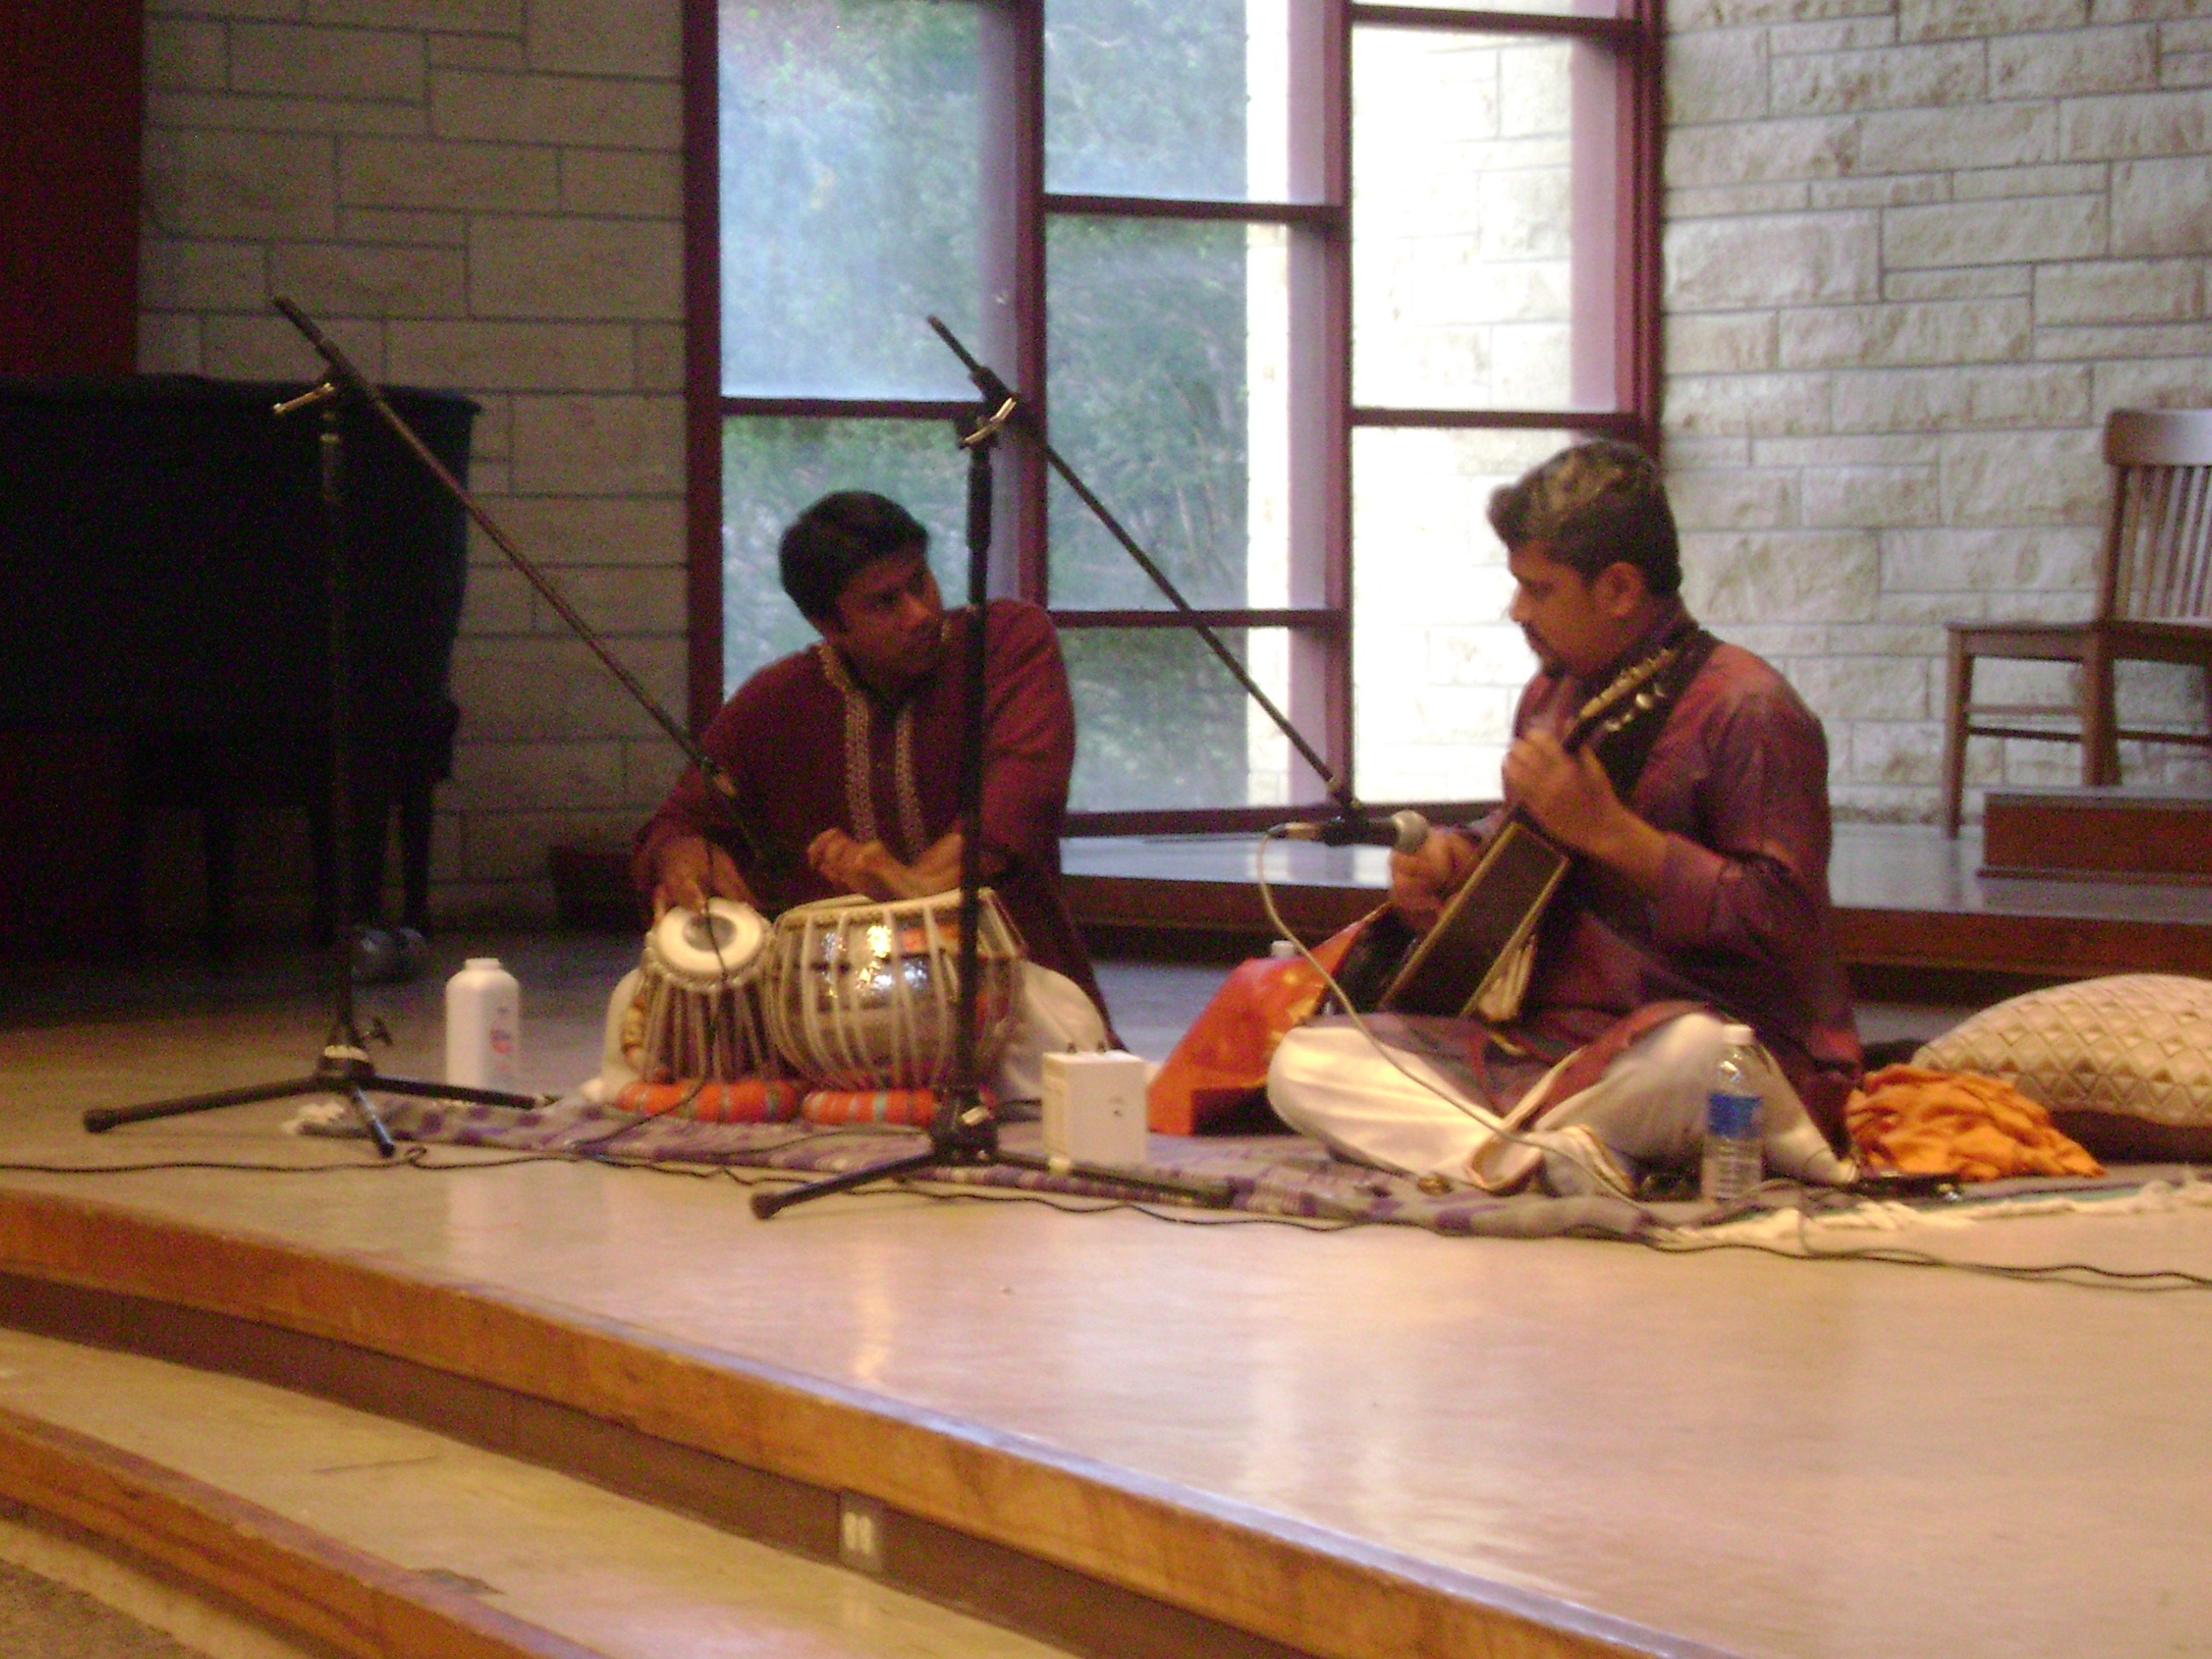 Anirban with Snehashish Majumbar